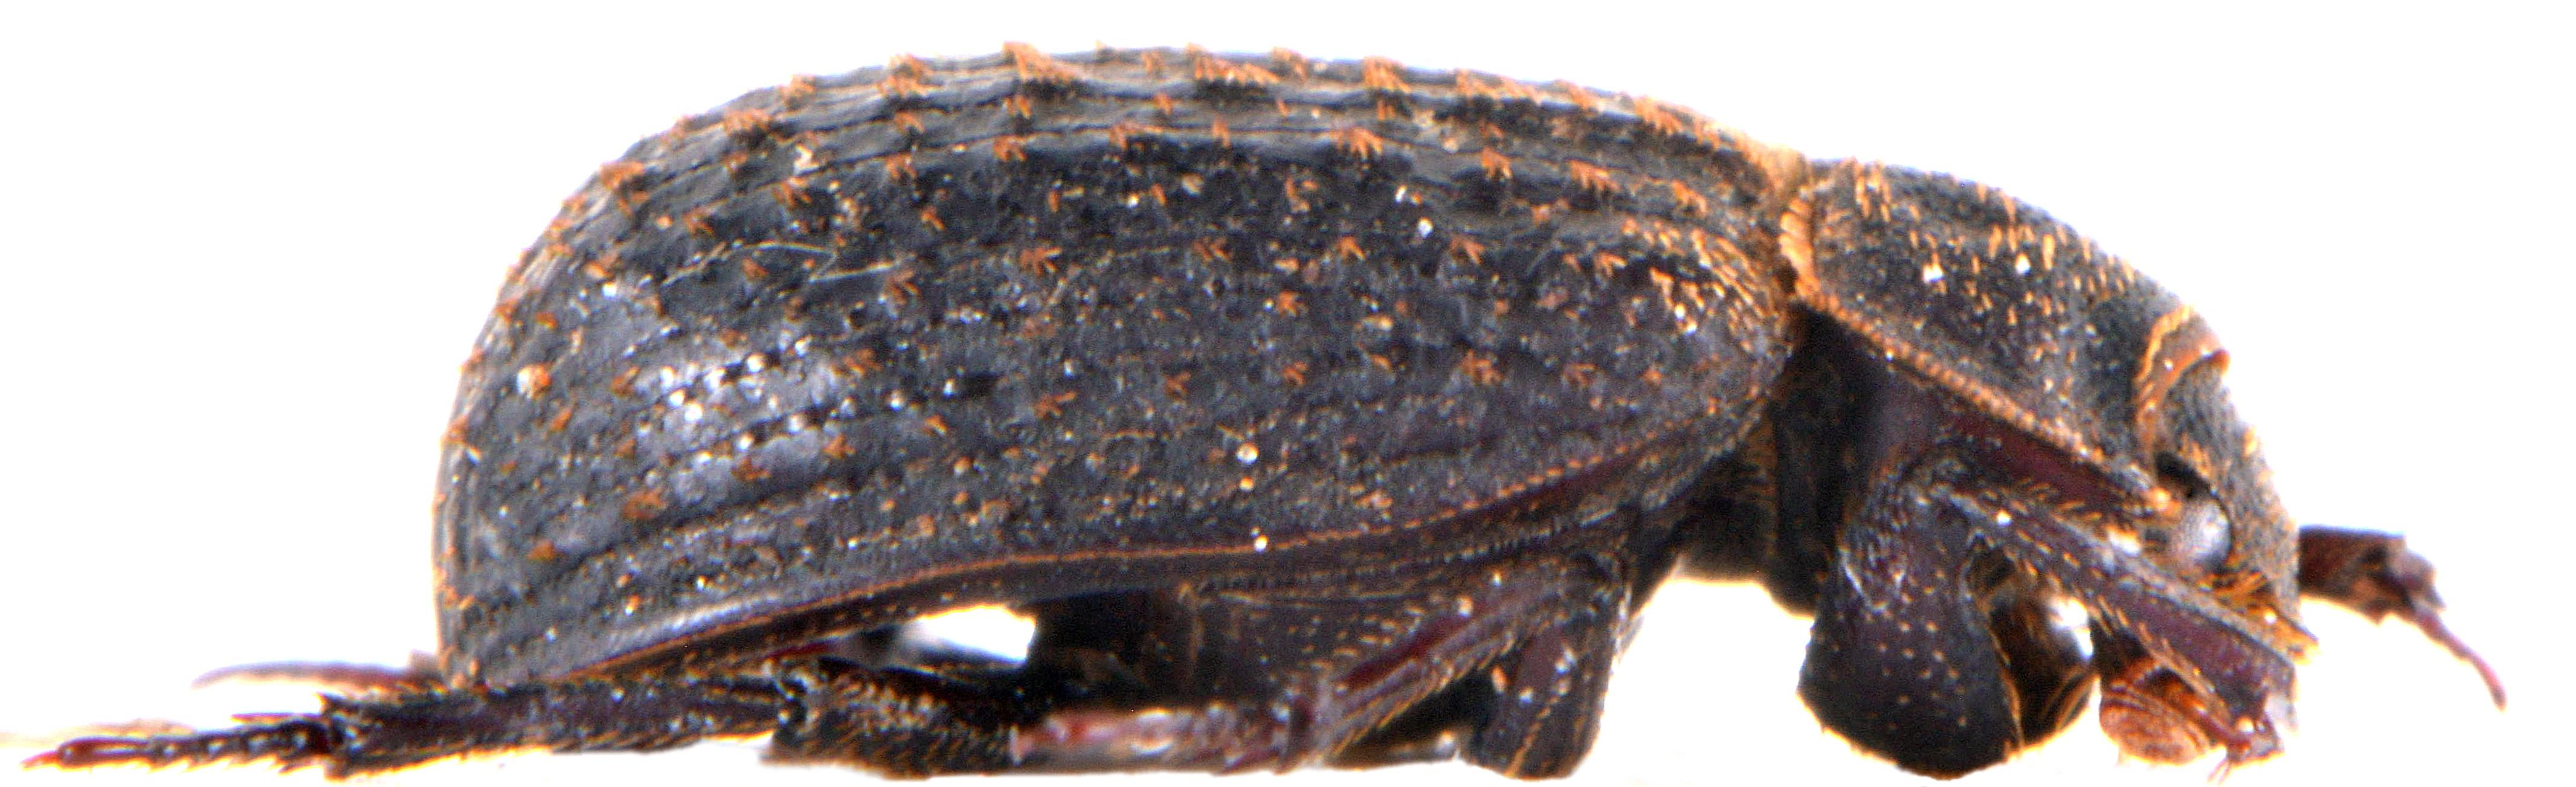 Trox sabulosus